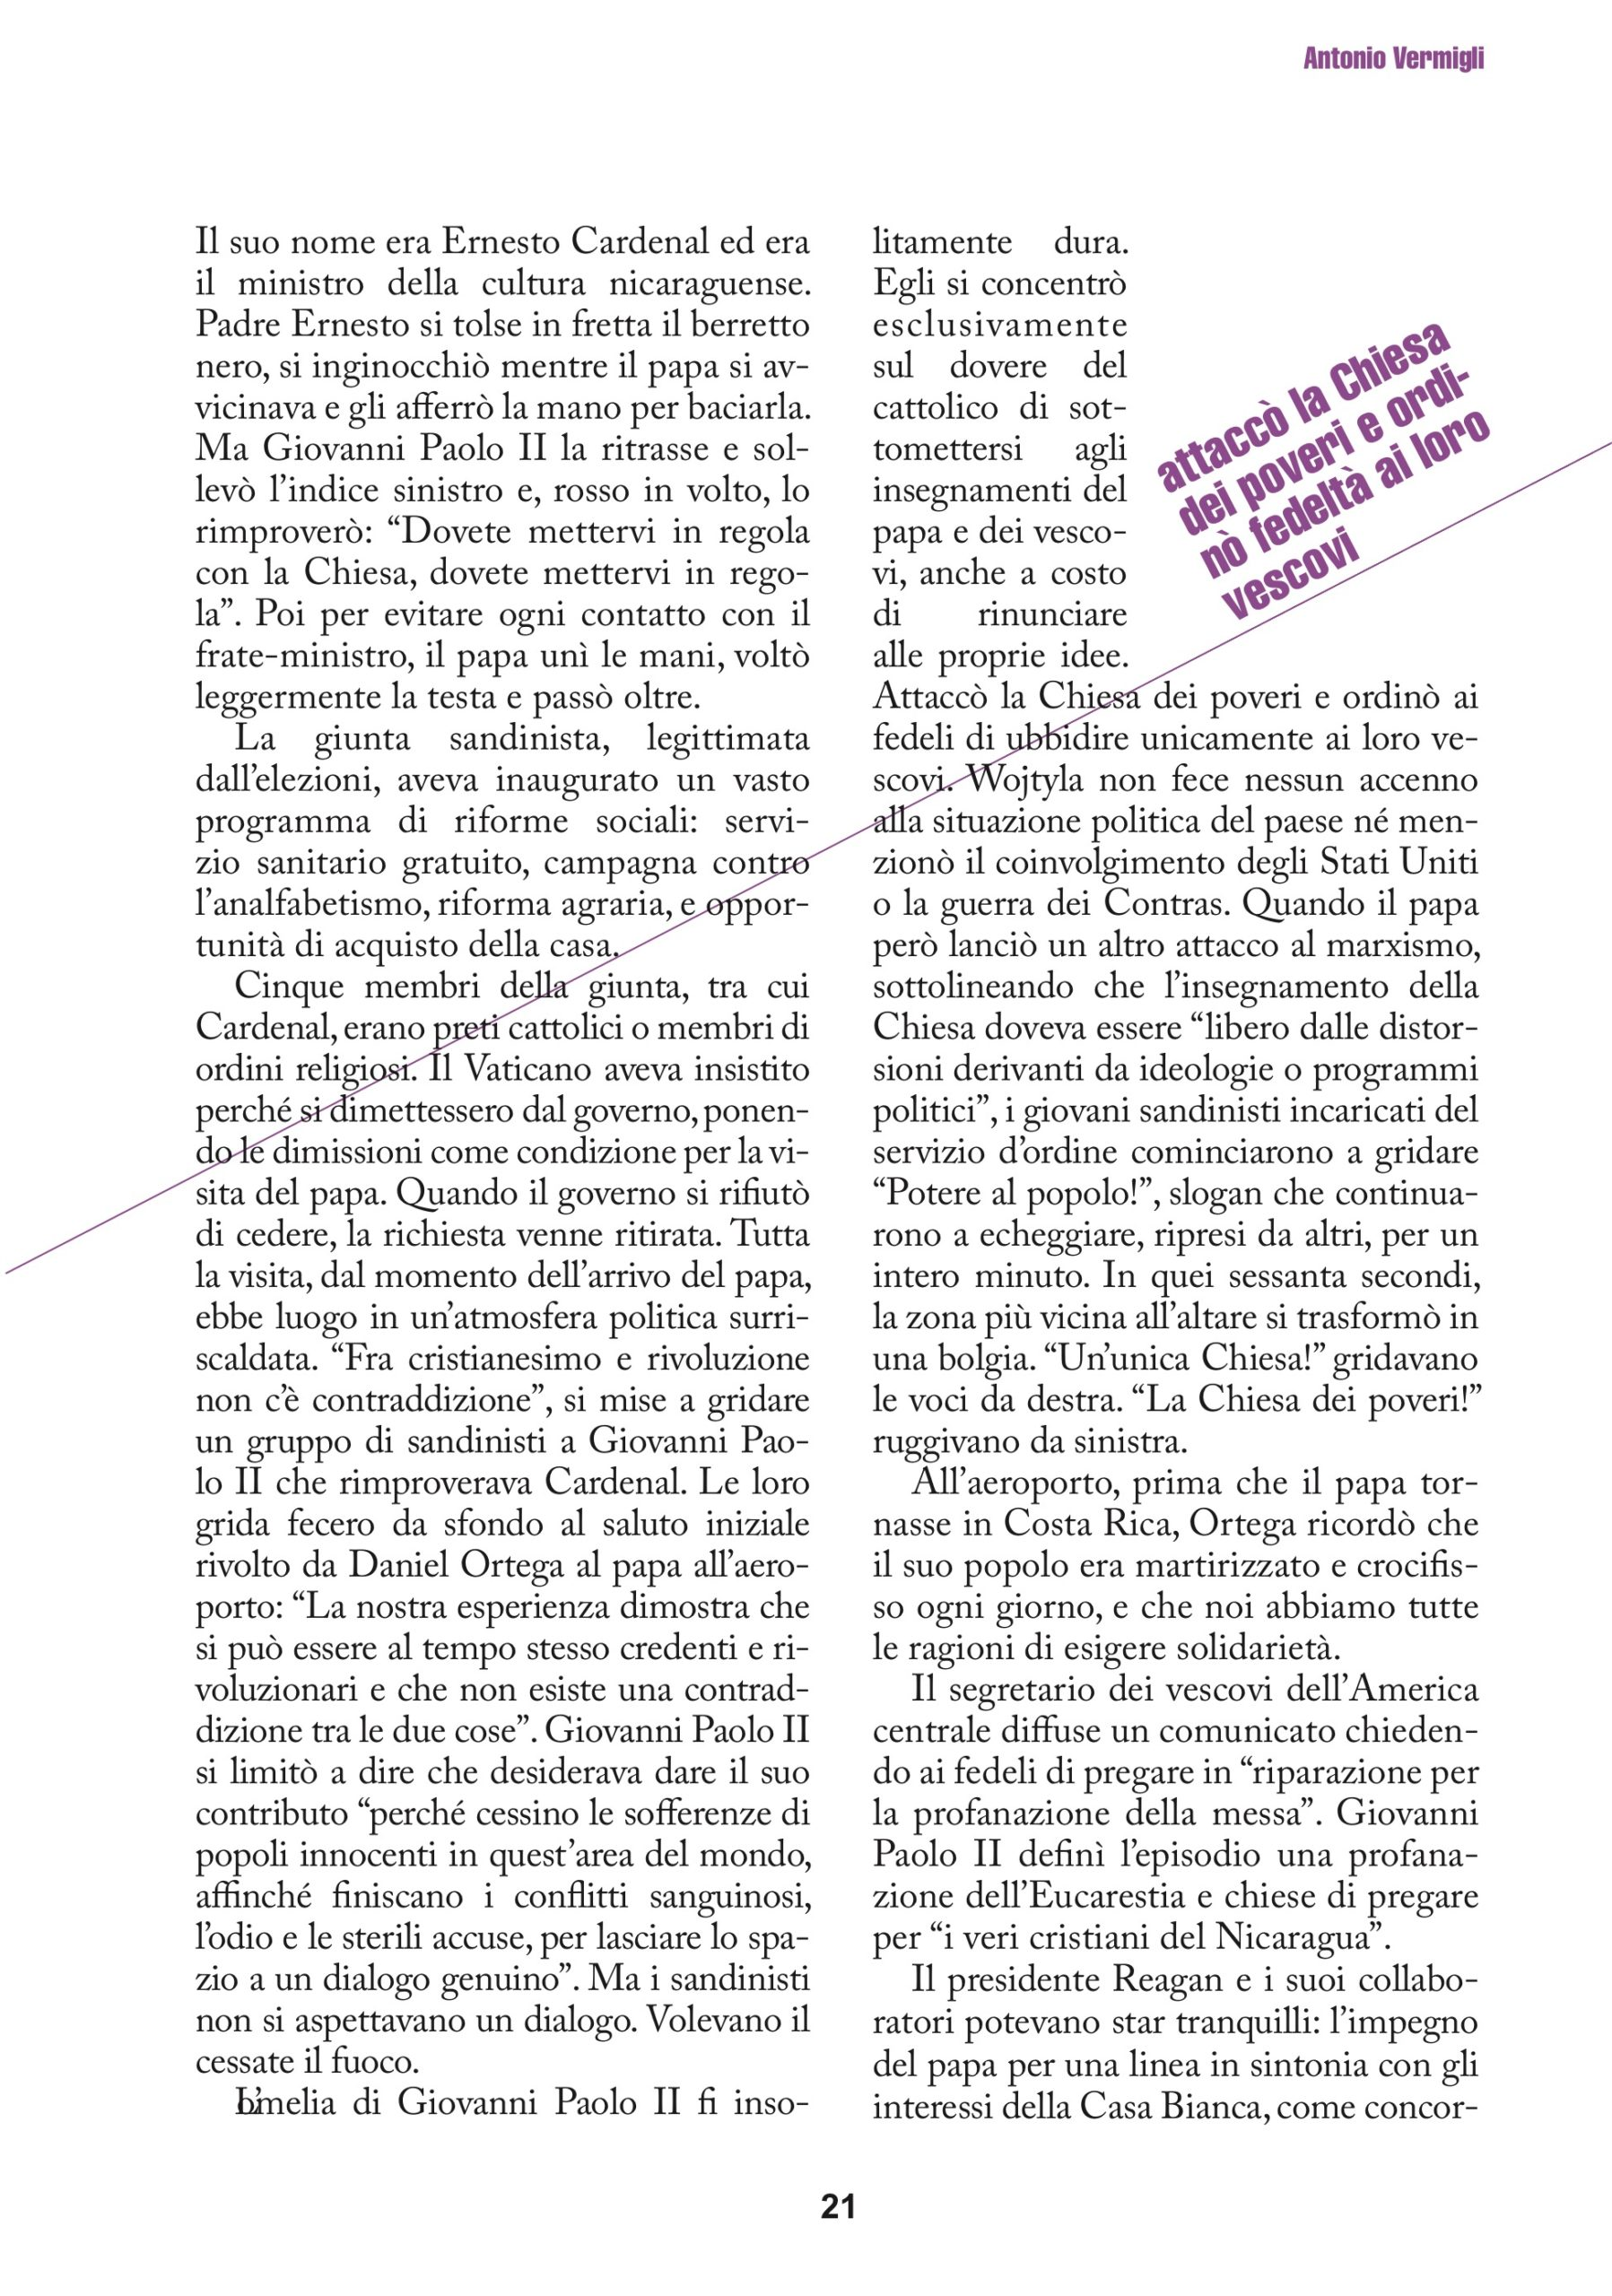 Vermigli GPII páginas 13 - 22-9